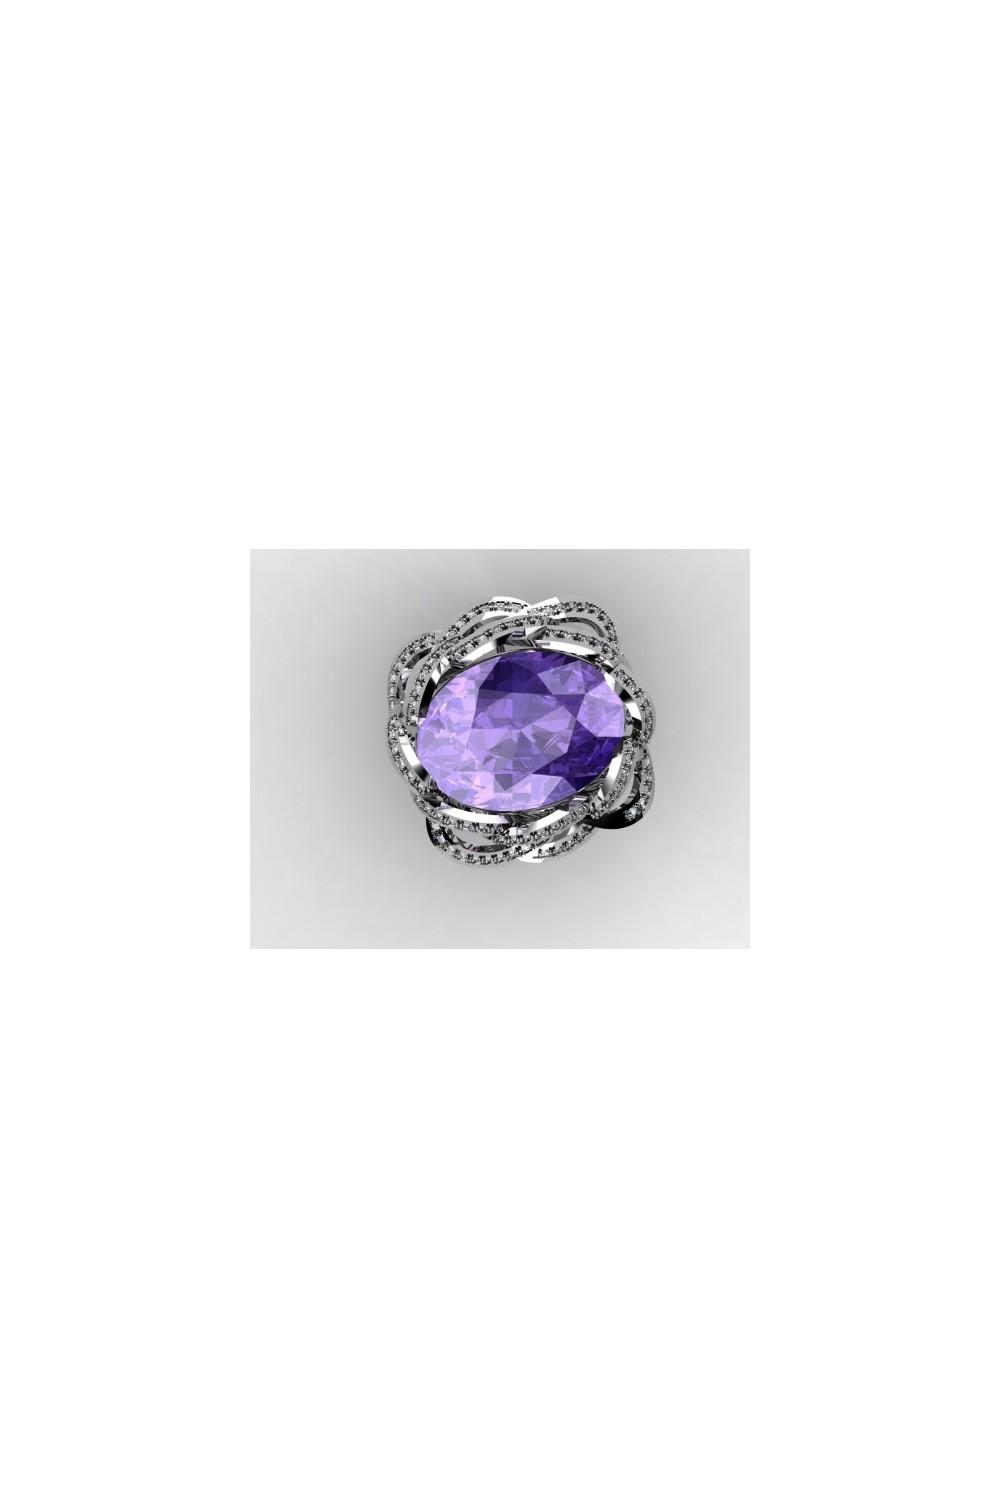 18k White Gold Amethyst Oval Shaped Gemstone Ring